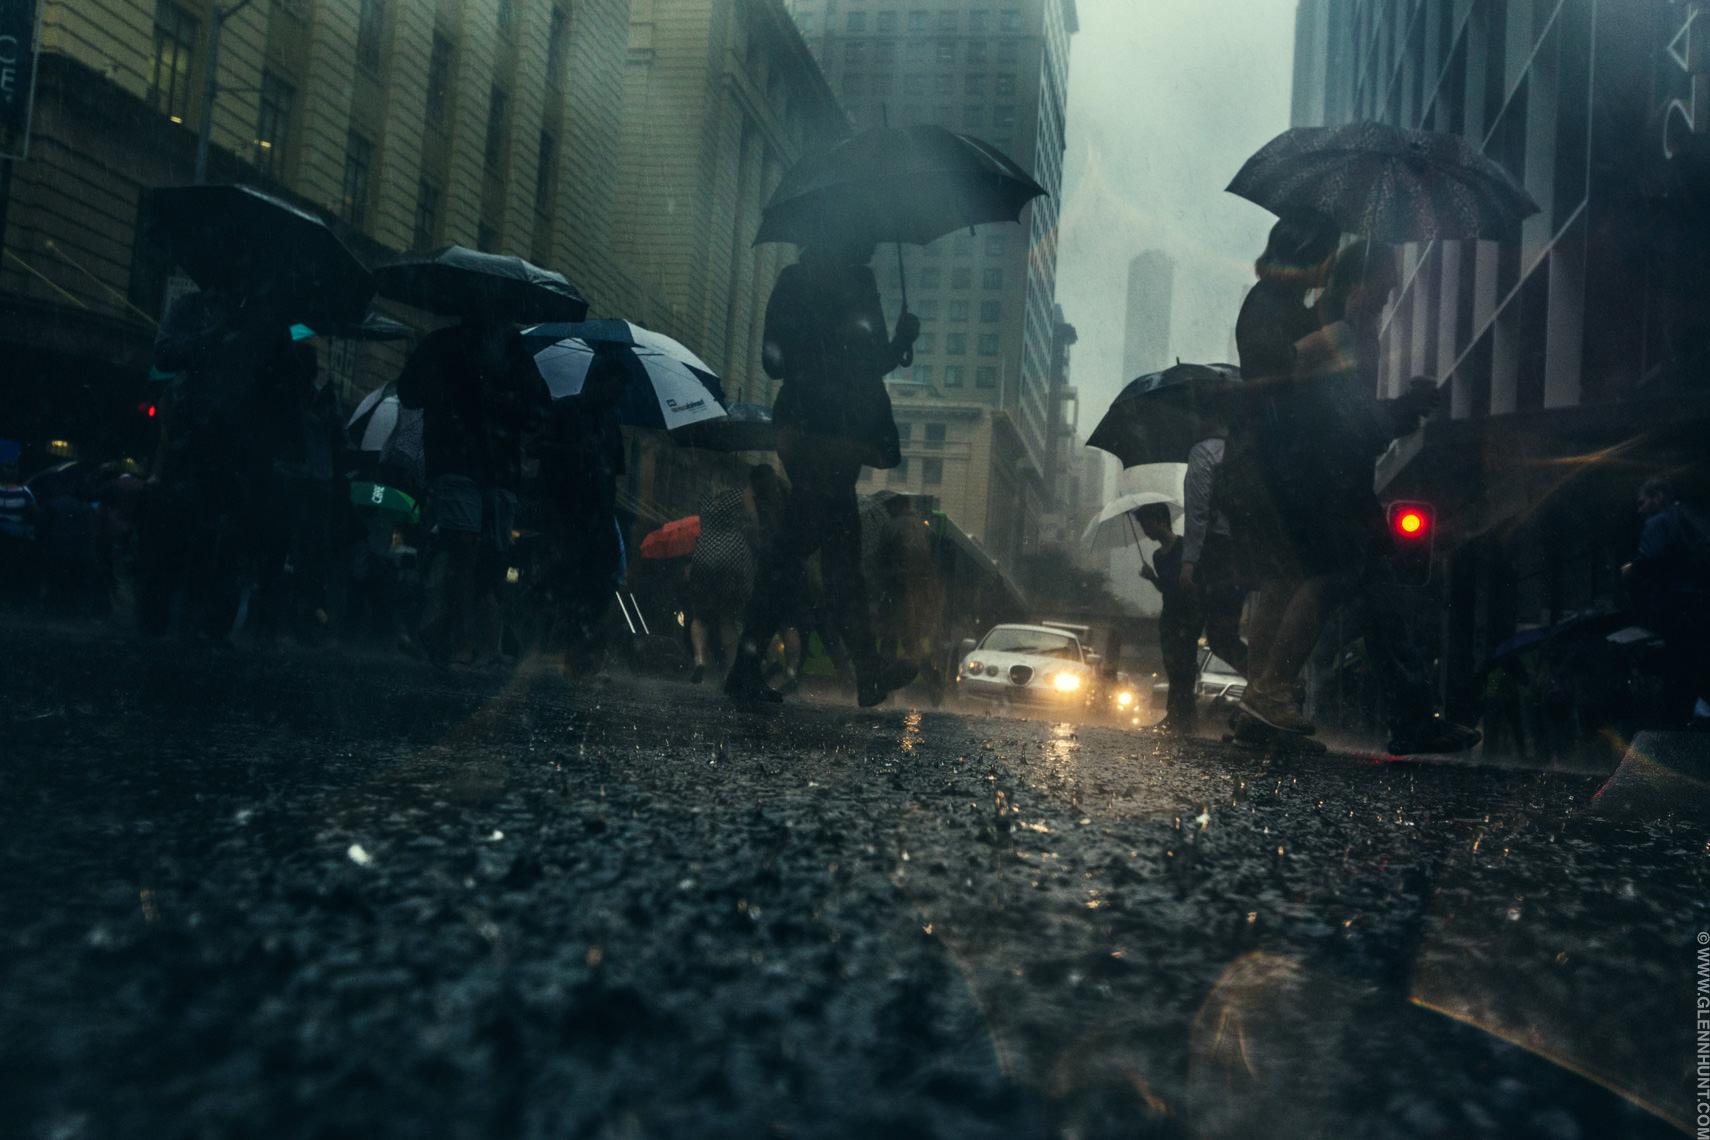 Australian Photojournalist